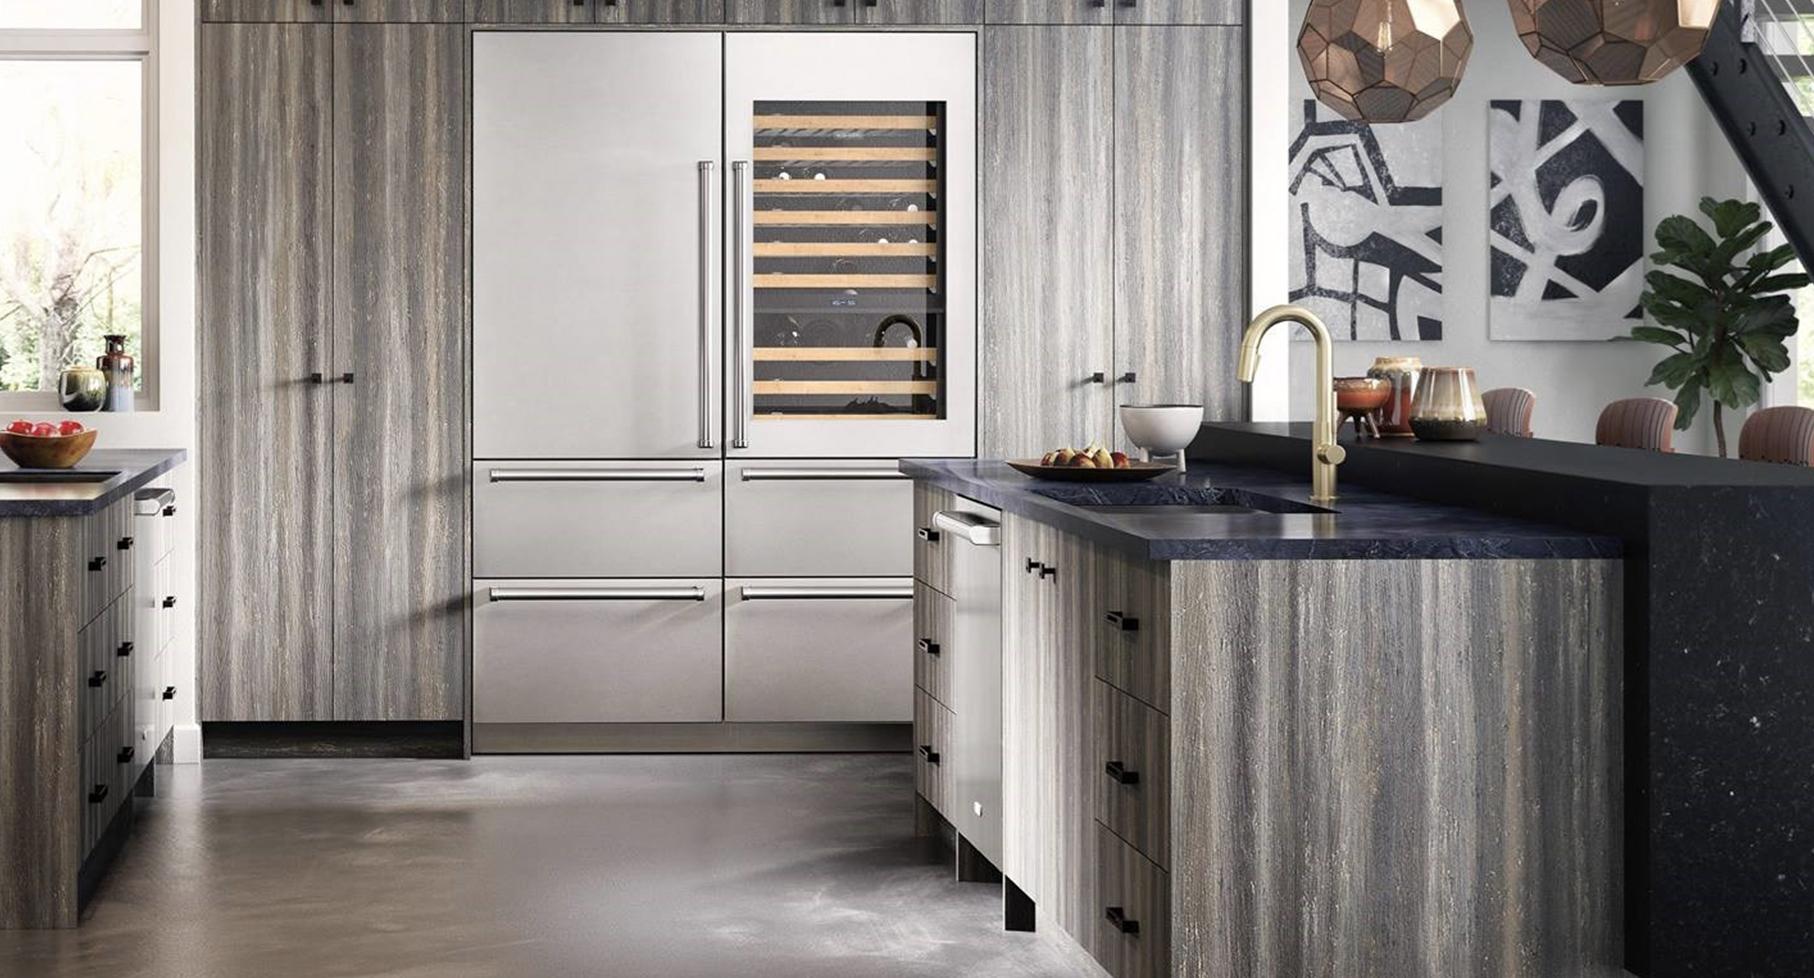 Sub-Zero fridge and wine rack and Cove dishwasher image